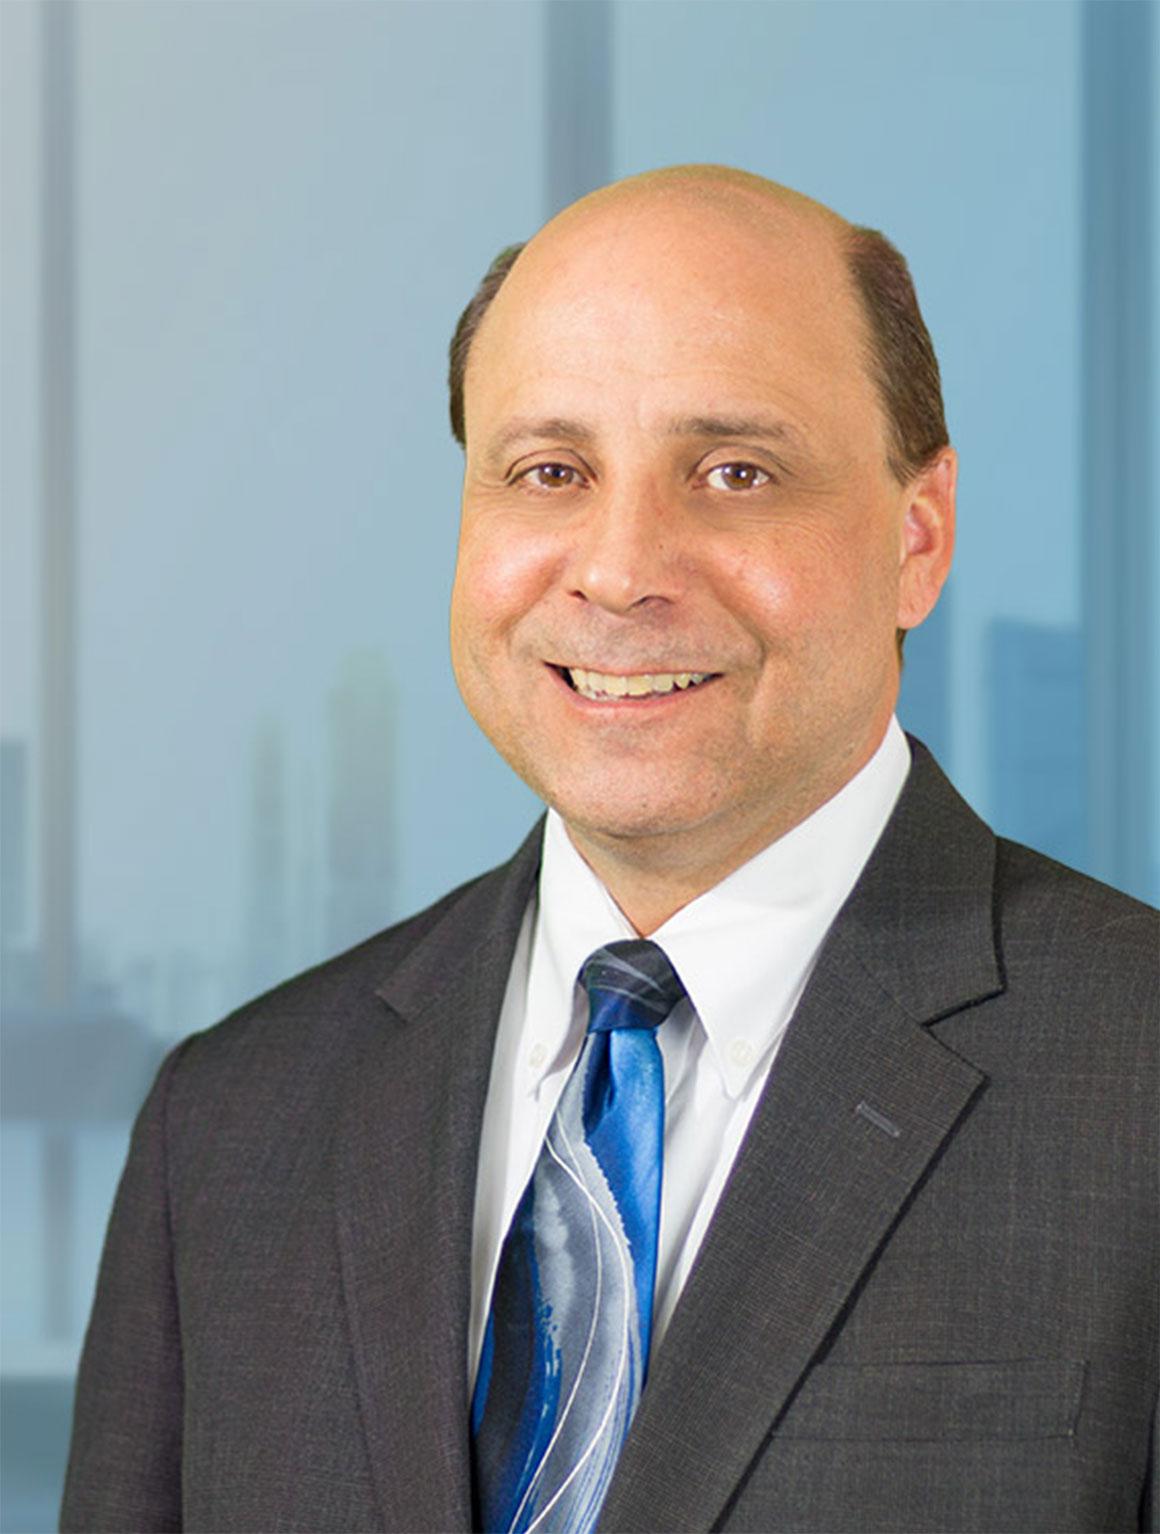 Michael J. Musella